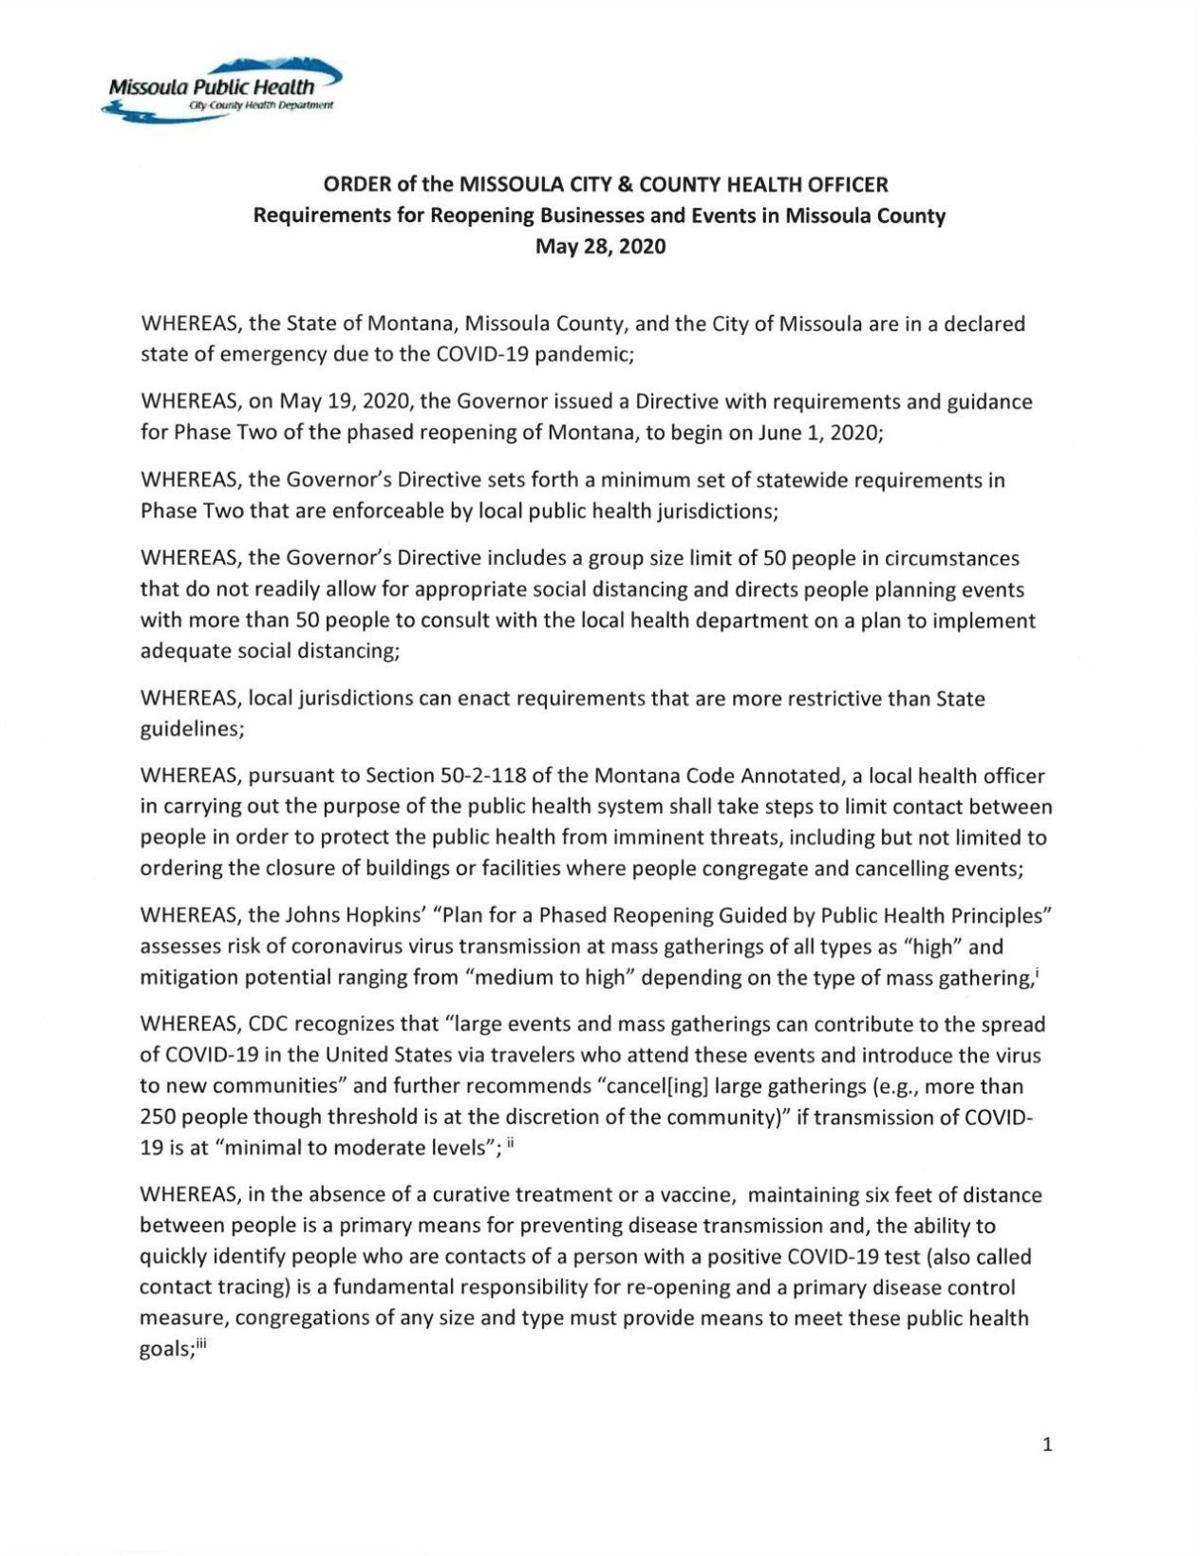 Read More Missoula Health Officer Order On May 28 Regional Khq Com